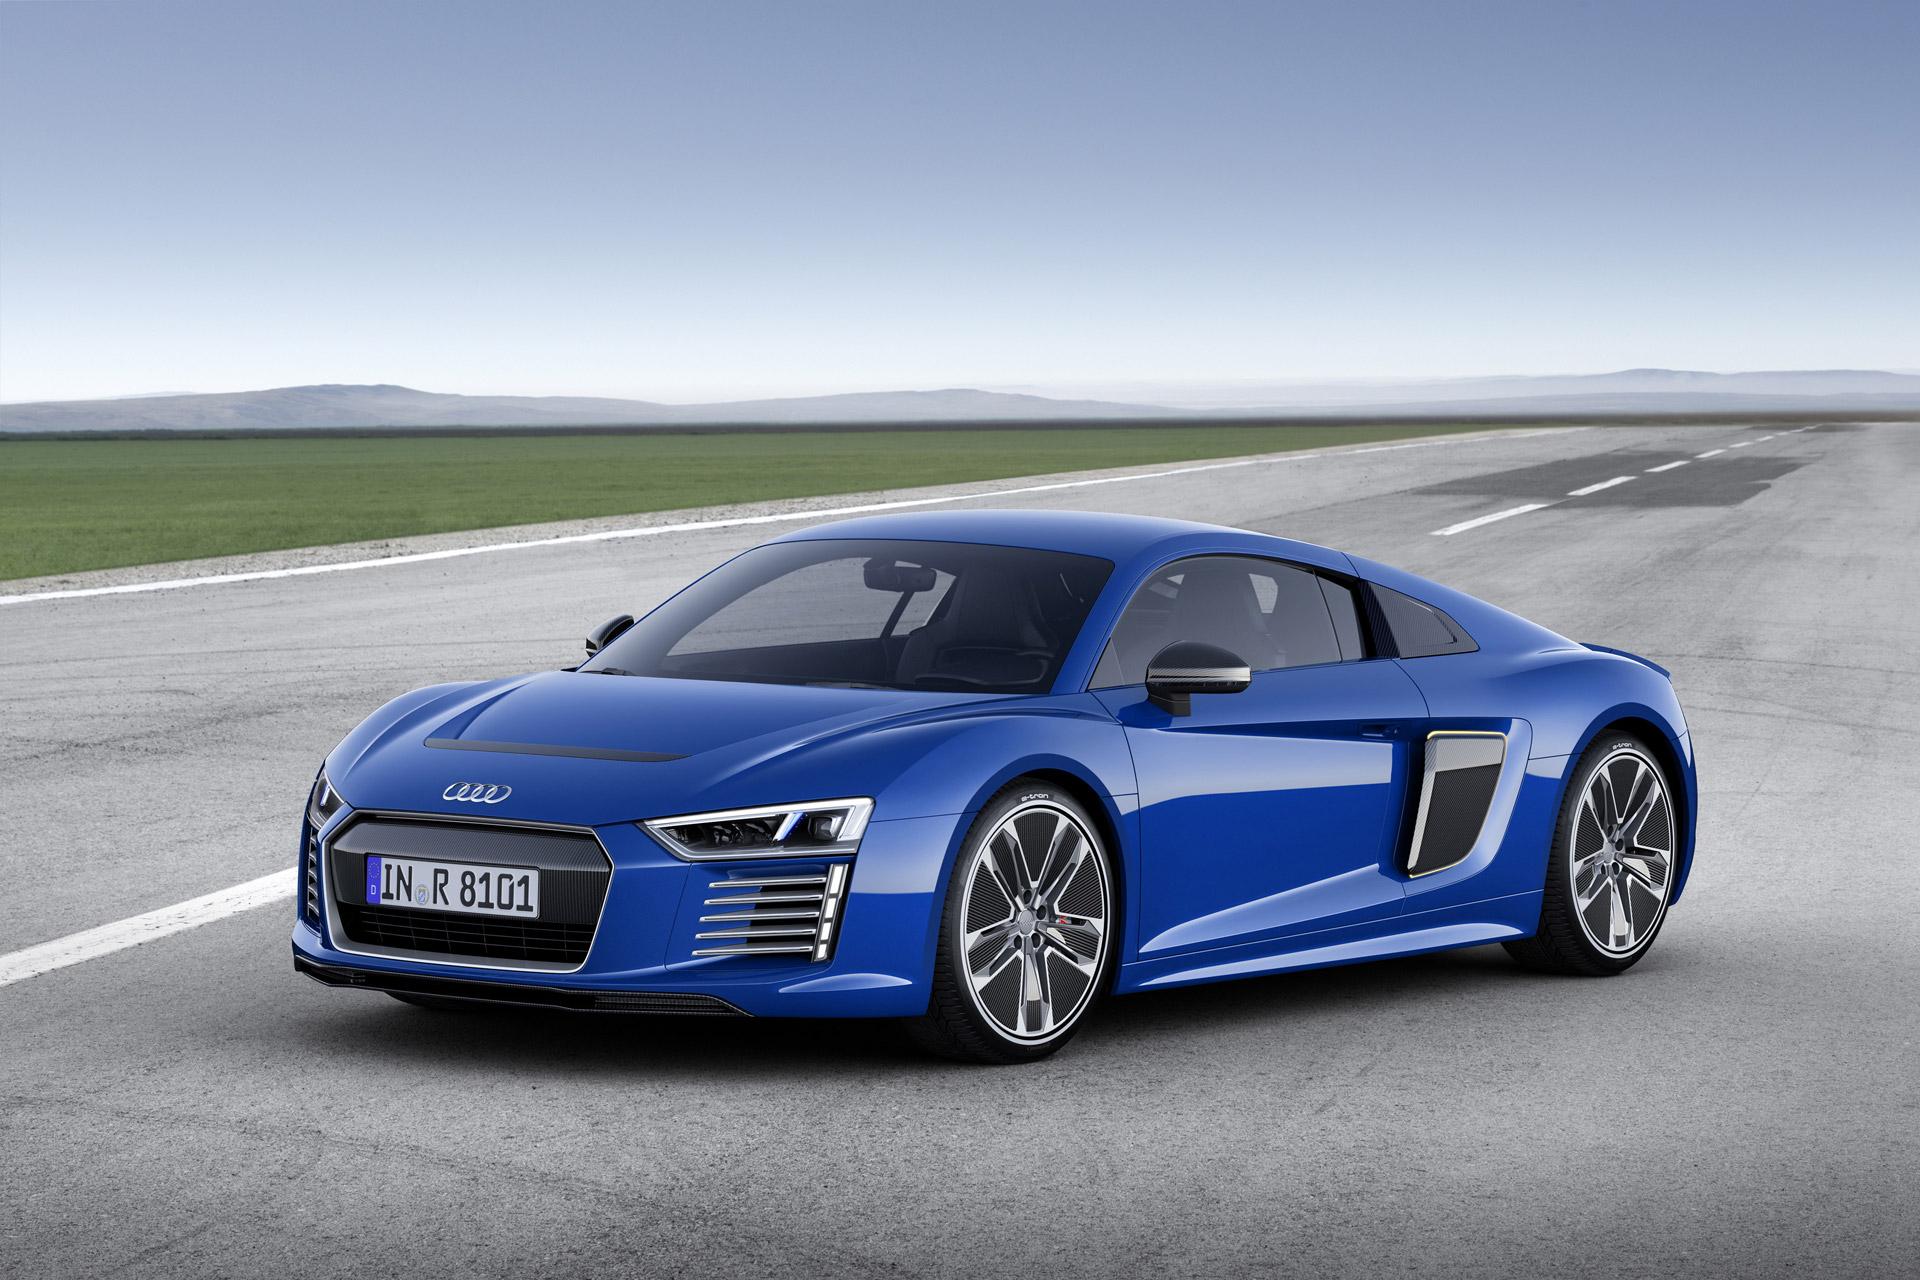 Offagain Onagain Audi R Etron Ended After Built - Audi r8 car